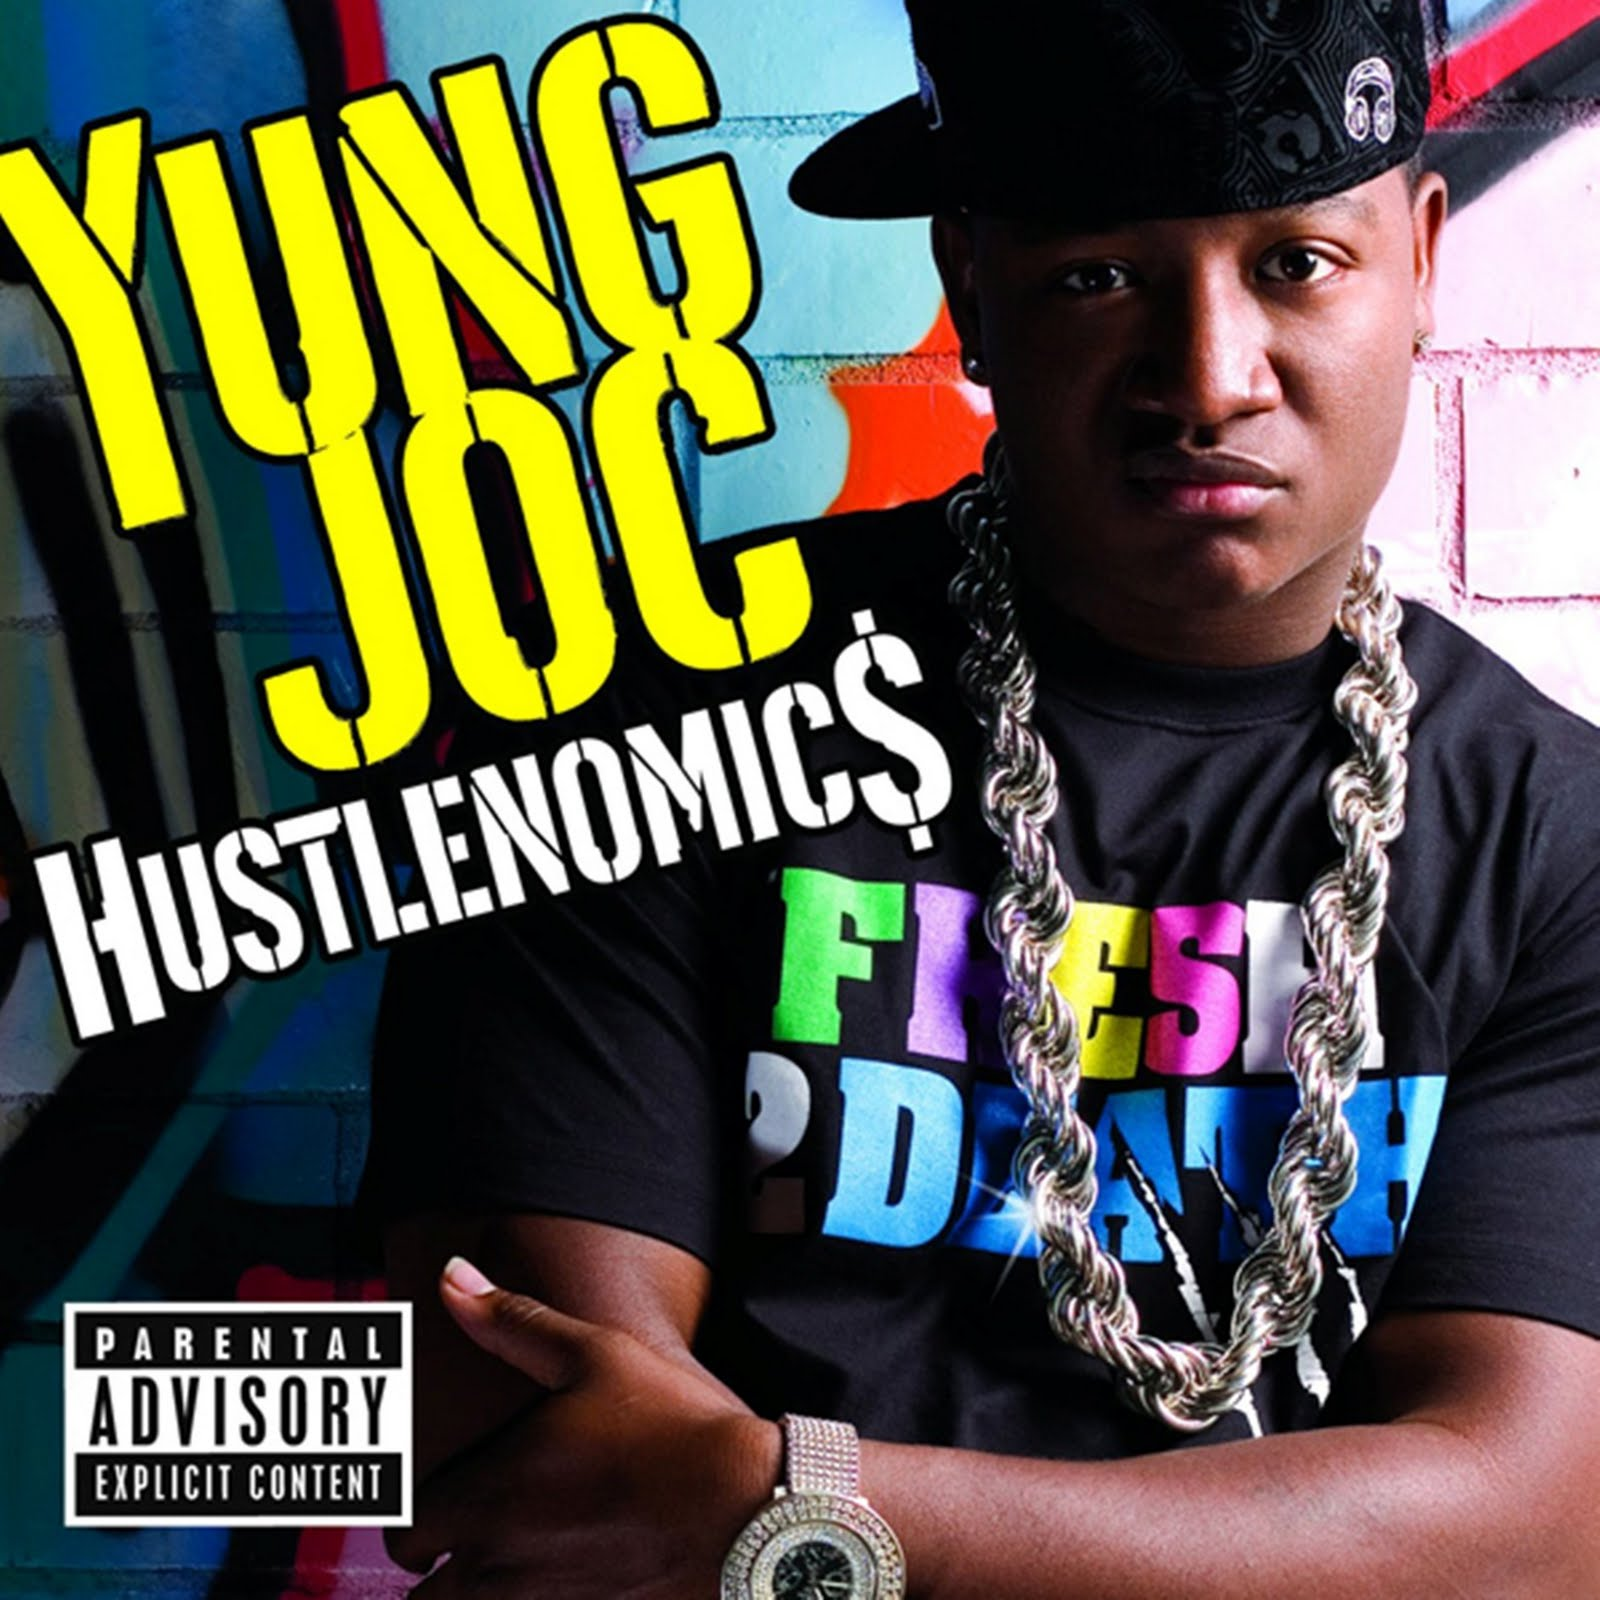 http://2.bp.blogspot.com/_L0deb0c7_Rs/S8GTyOpCccI/AAAAAAAAB7o/1_bUHIrCTyA/s1600/yung_joc_hustlenomics_2007_retail_cd-front.jpg